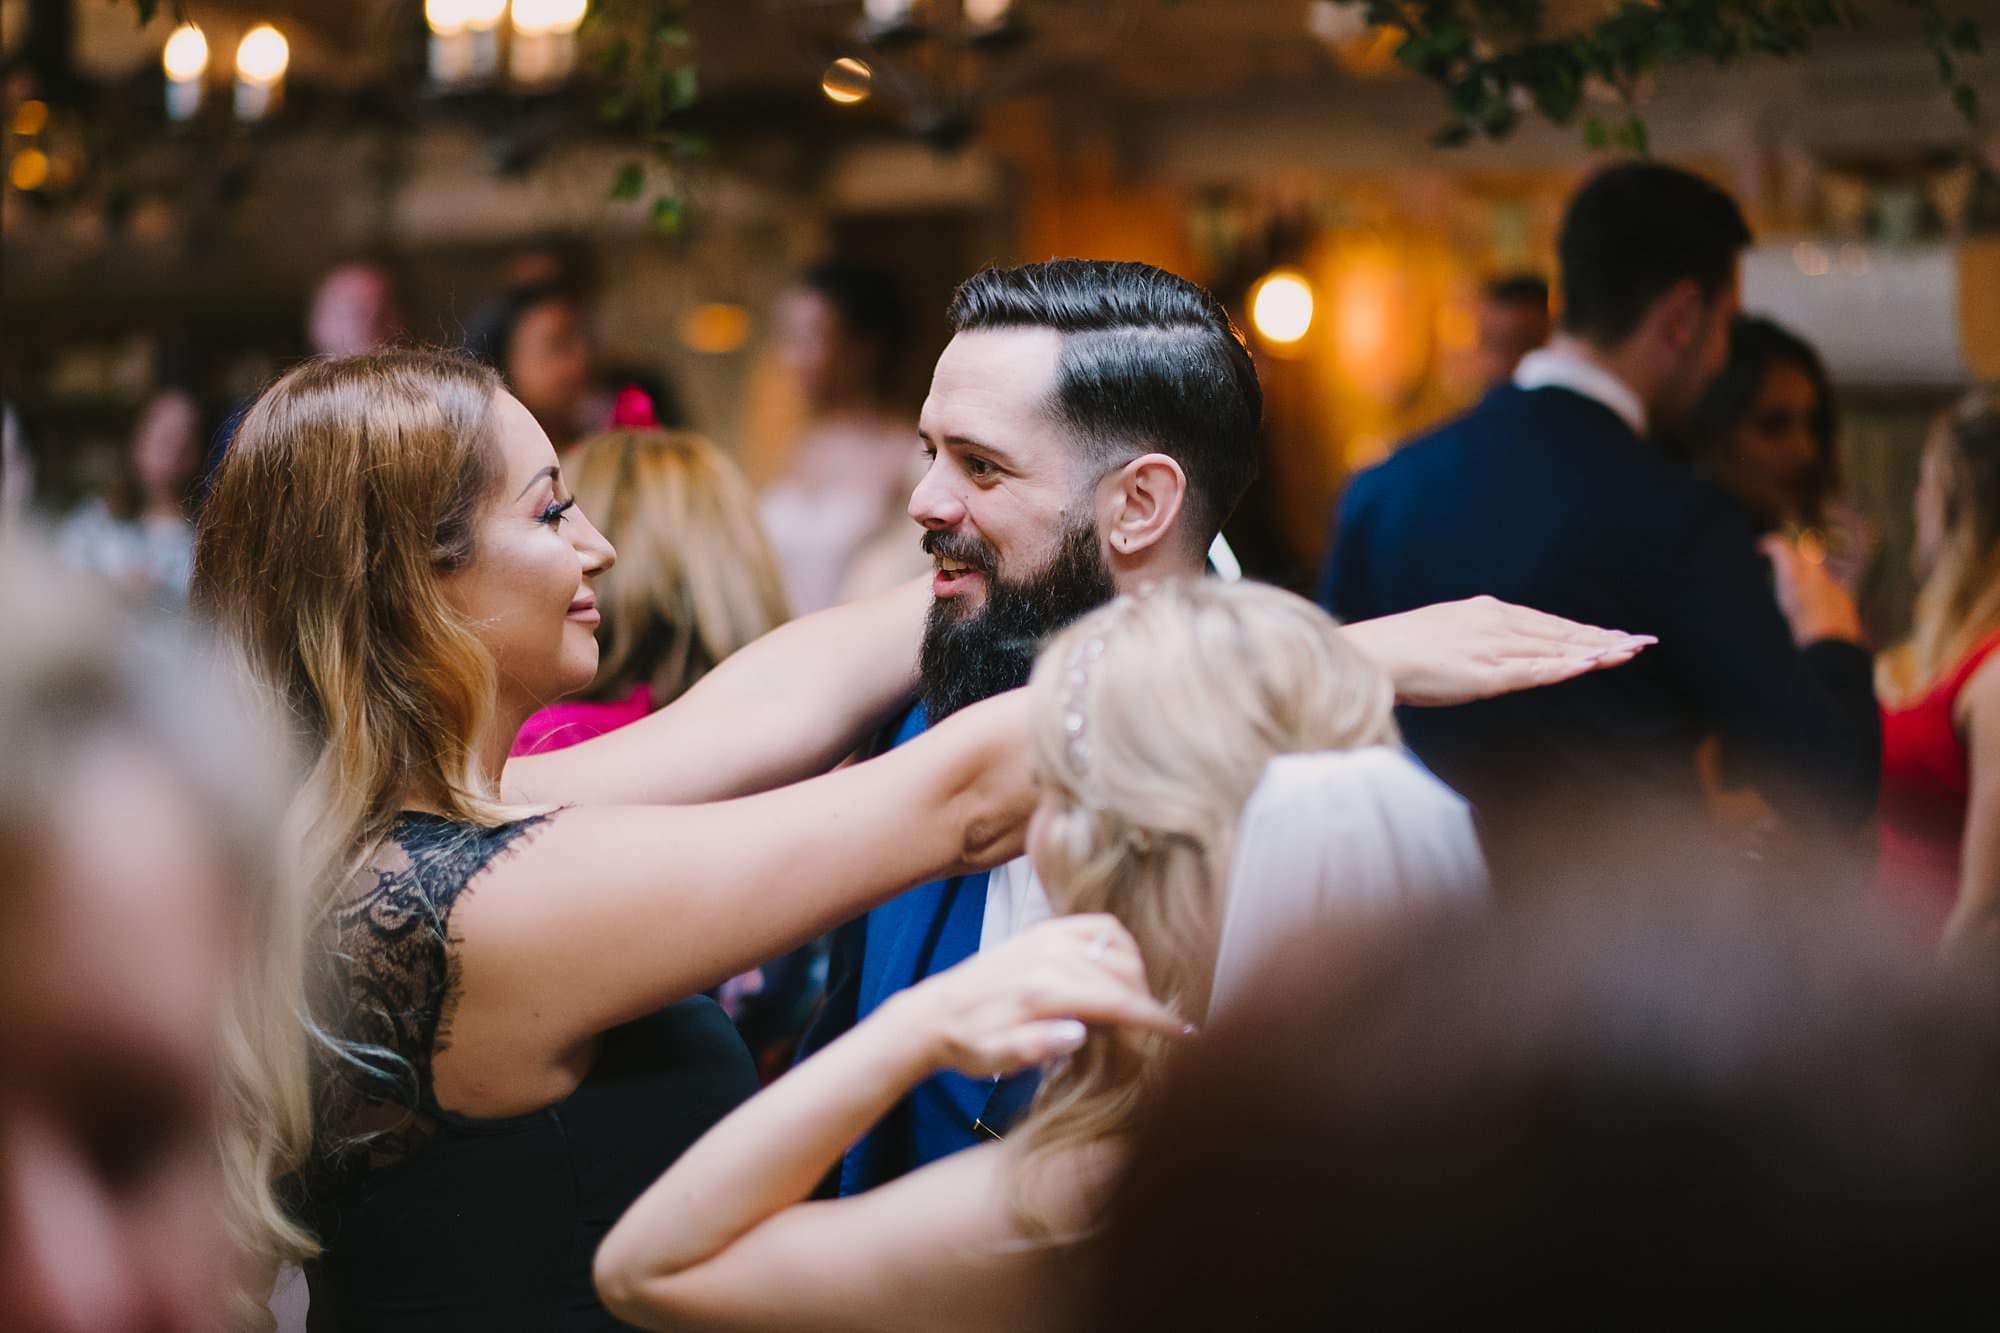 london pub wedding photographer jn 063 - The County Arms Wedding Photographer   Jen & Nick